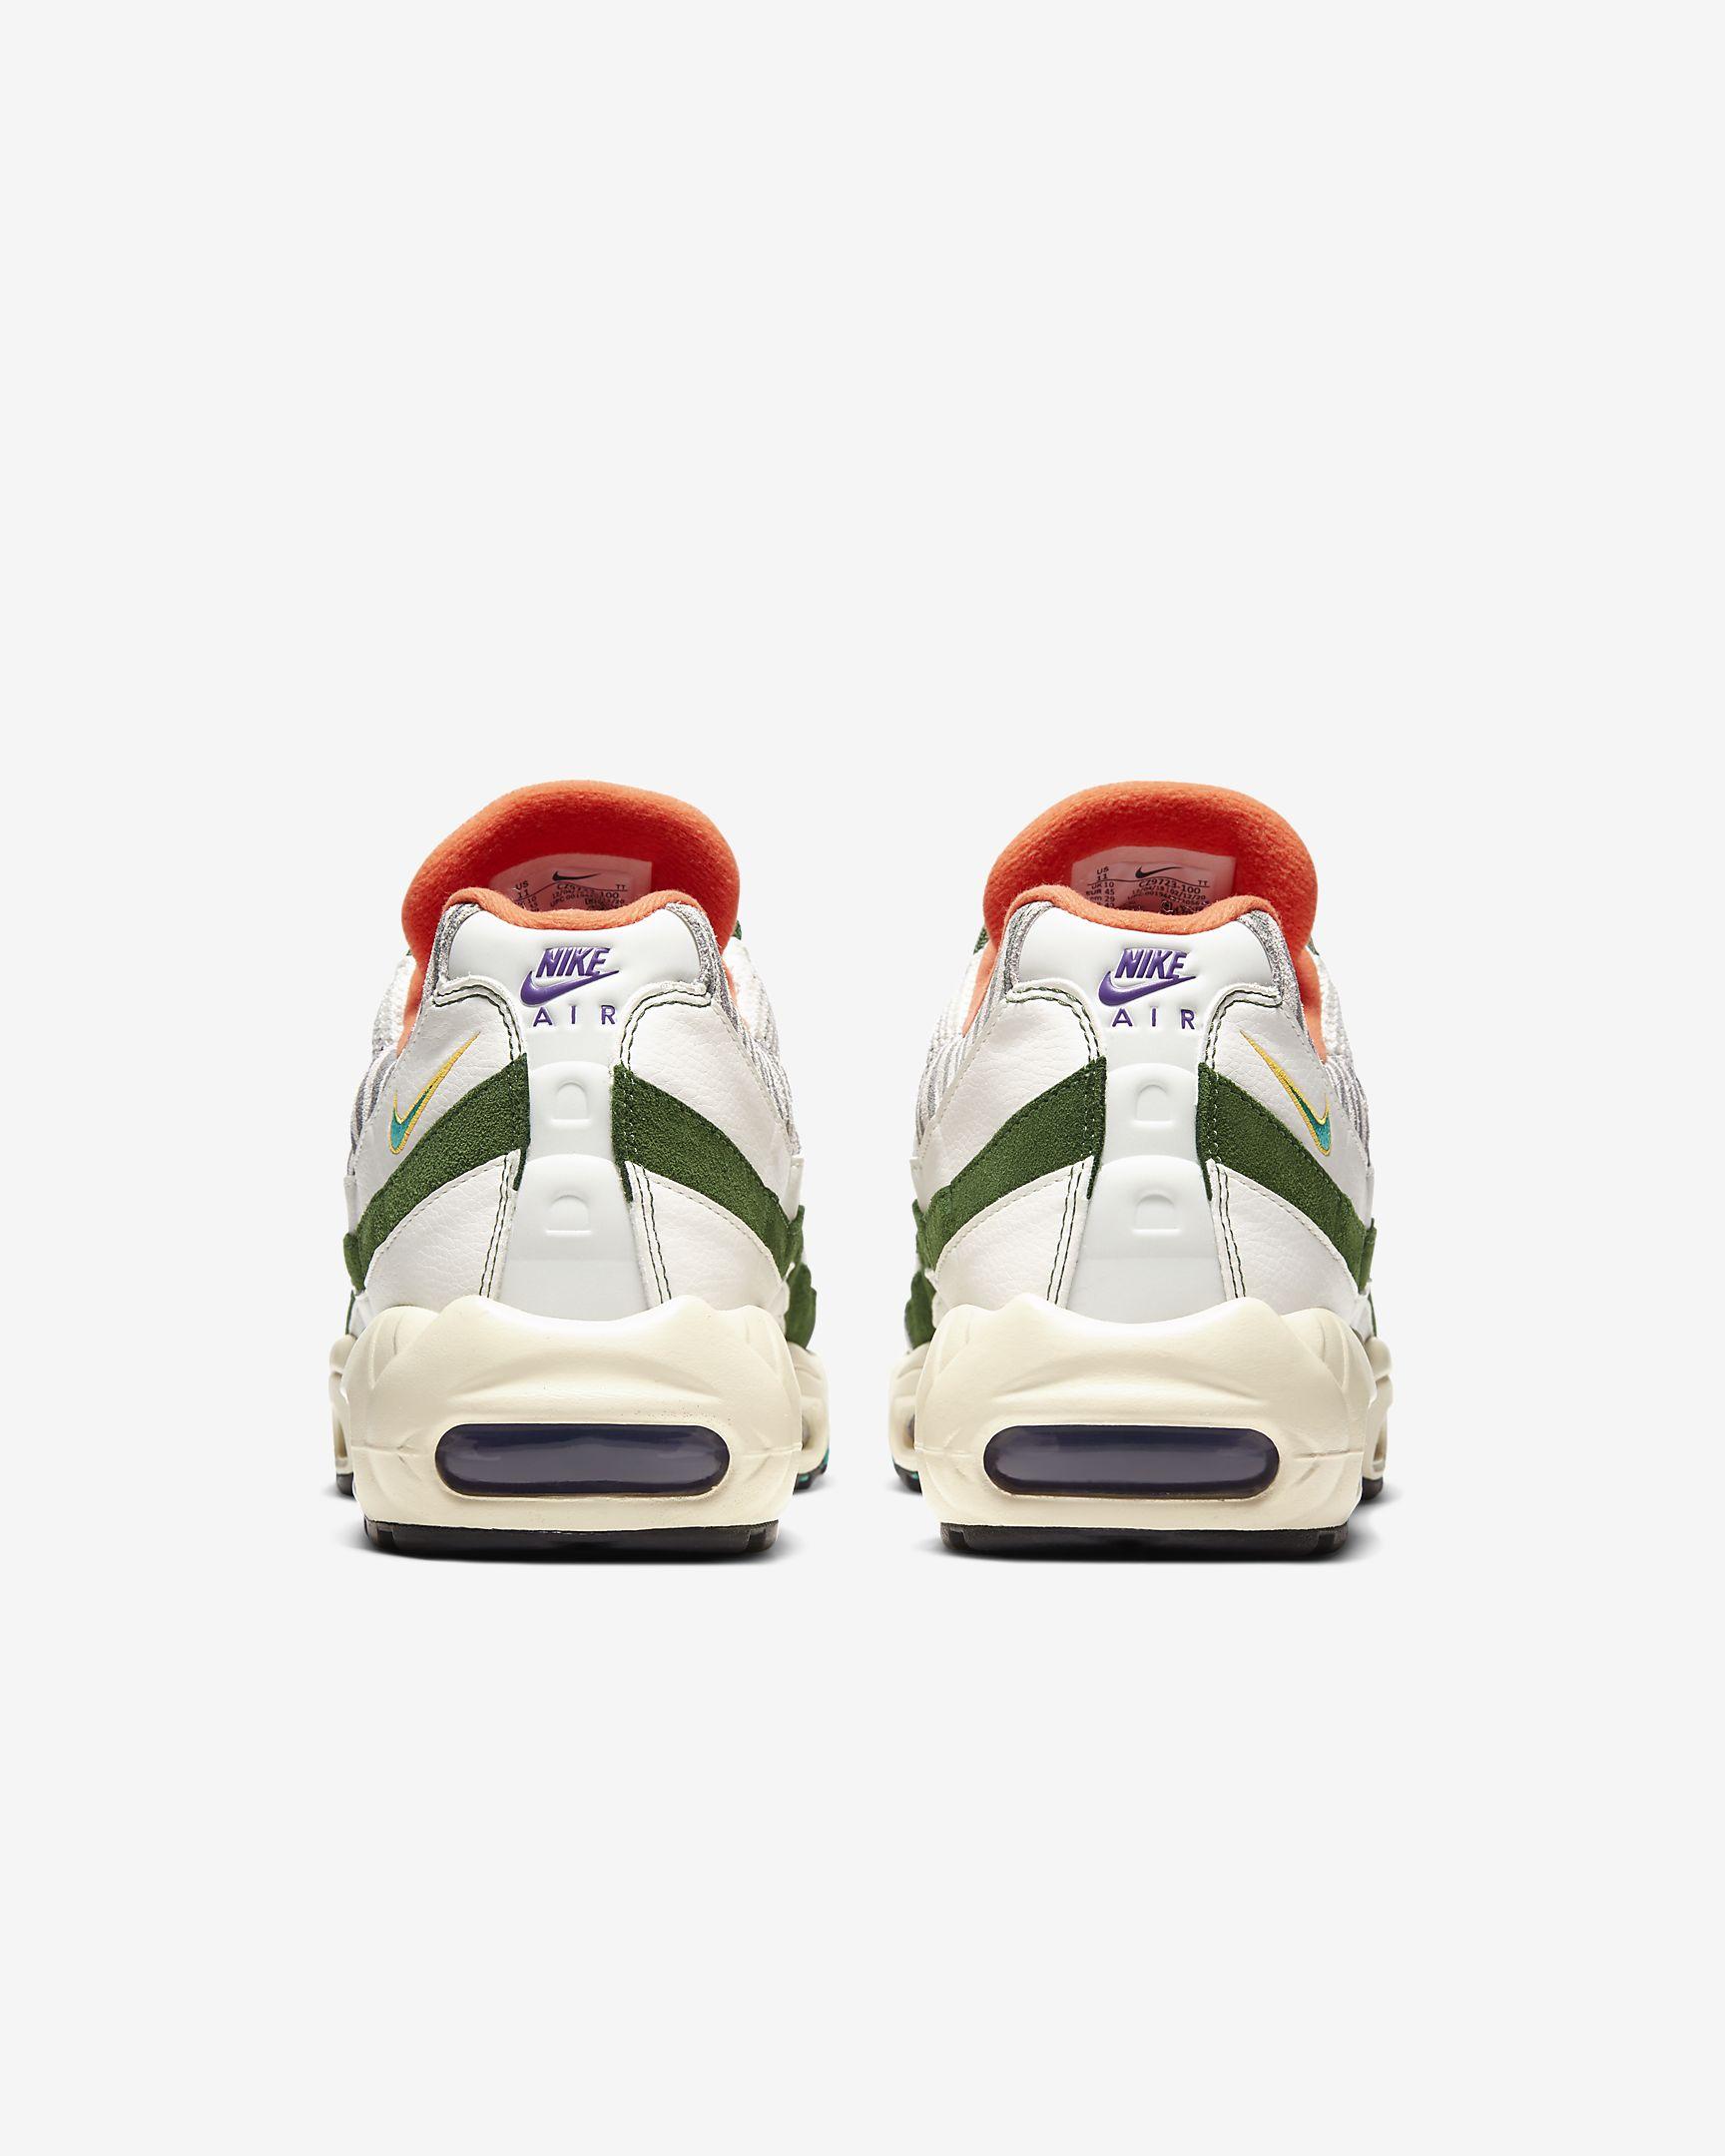 nike air max 95 era, sneakers, dierenprint, achterkant